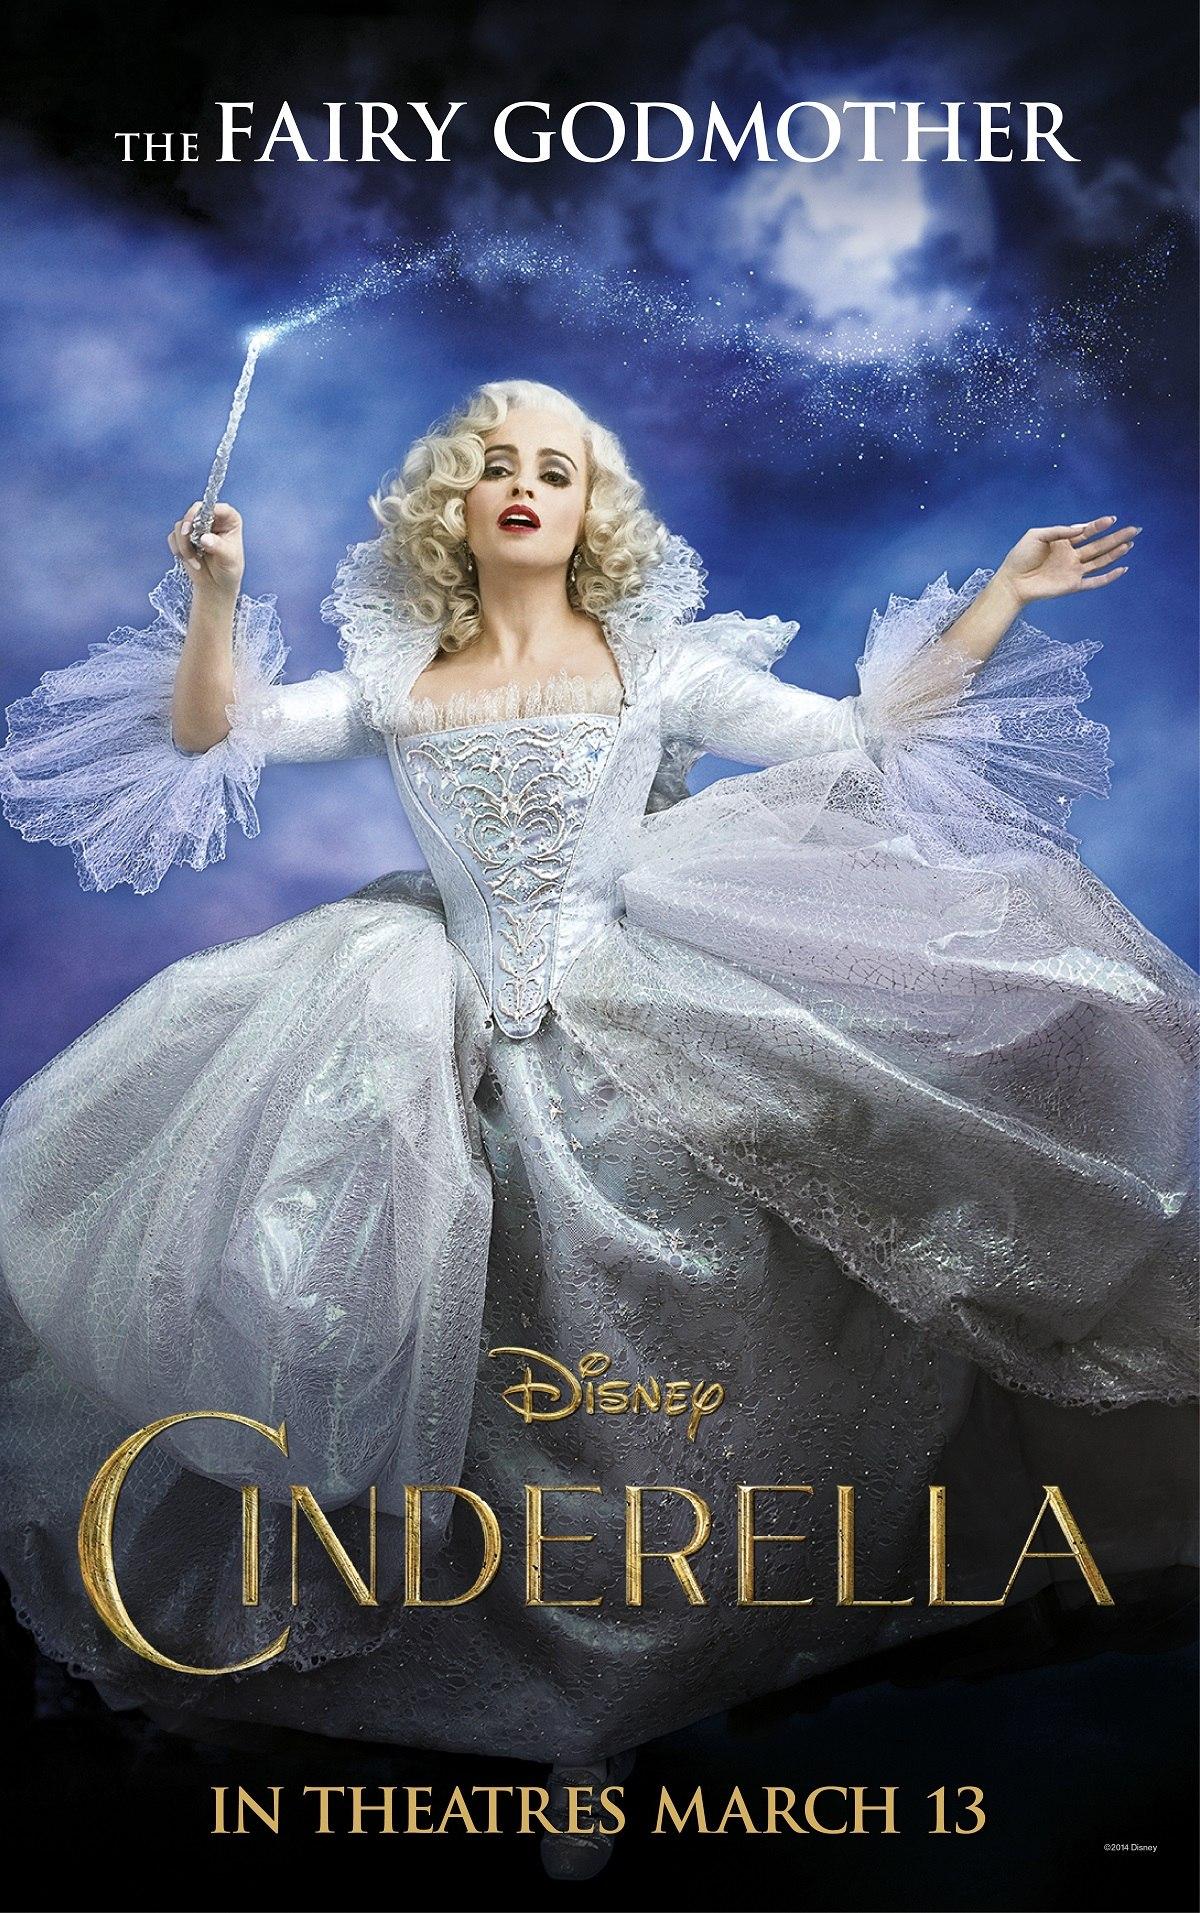 Cinderella is Produced by